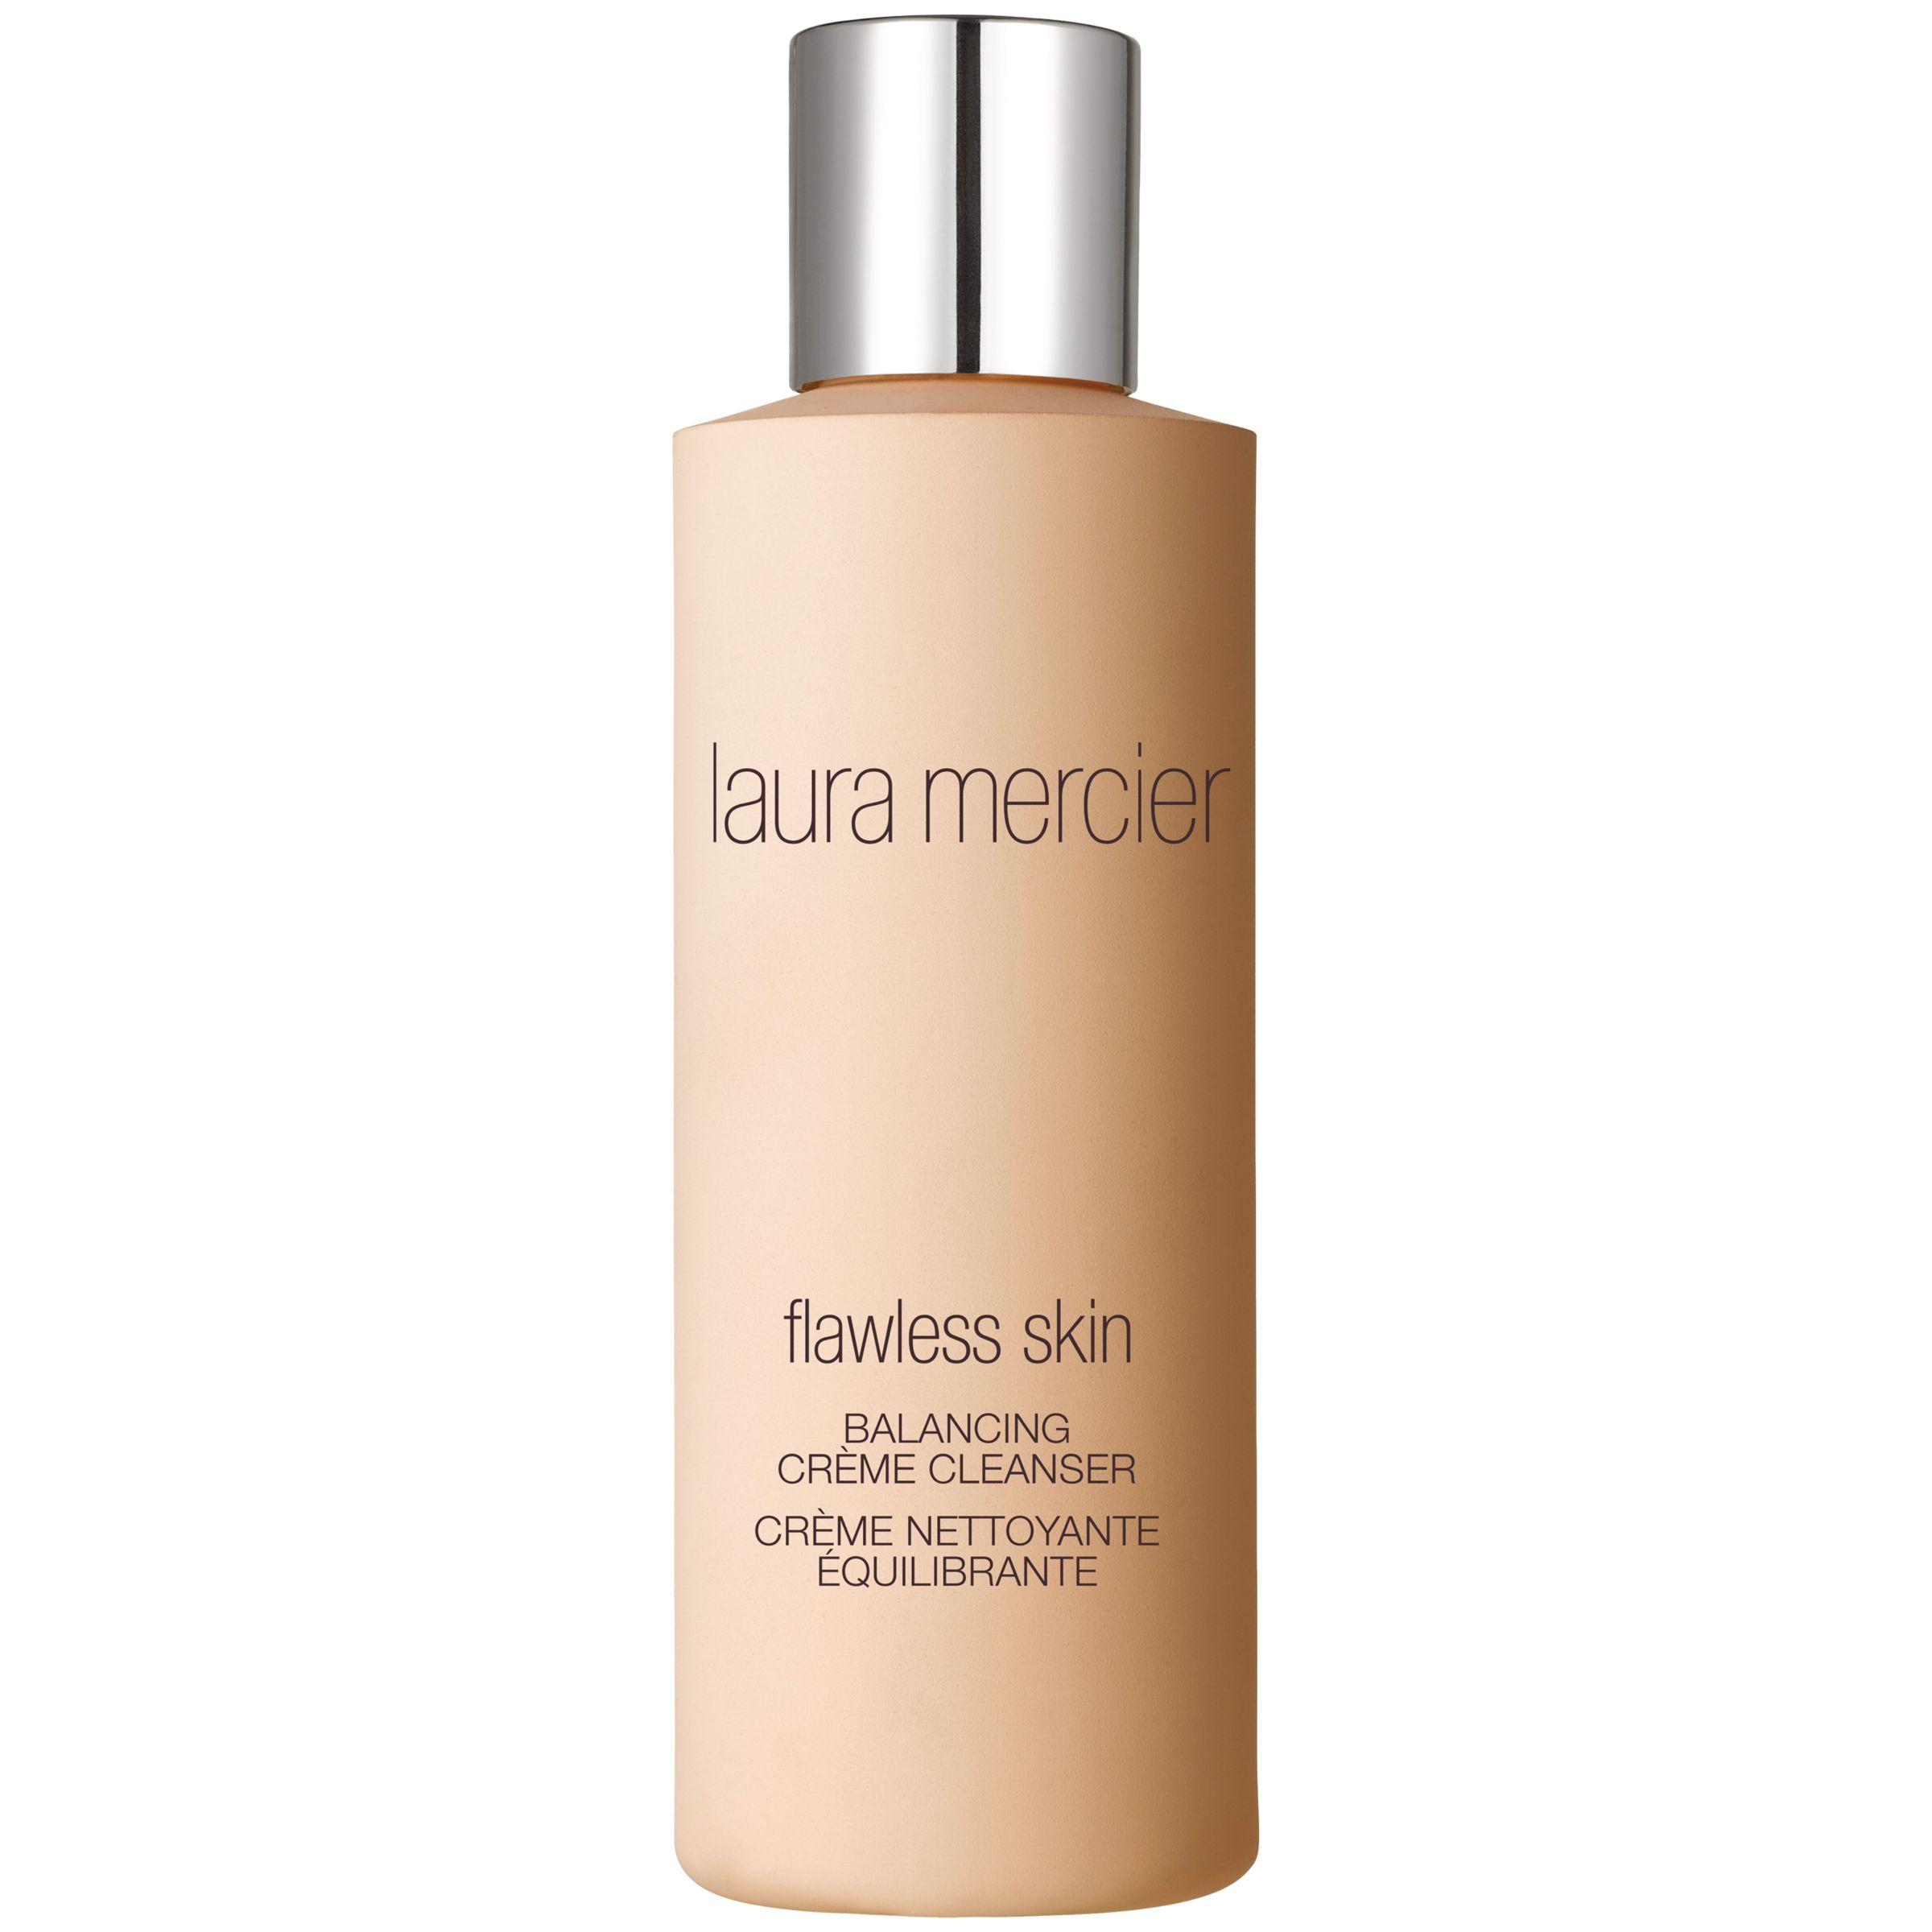 Laura Mercier Laura Mercier Flawless Skin Balancing Cream Cleanser, 200ml